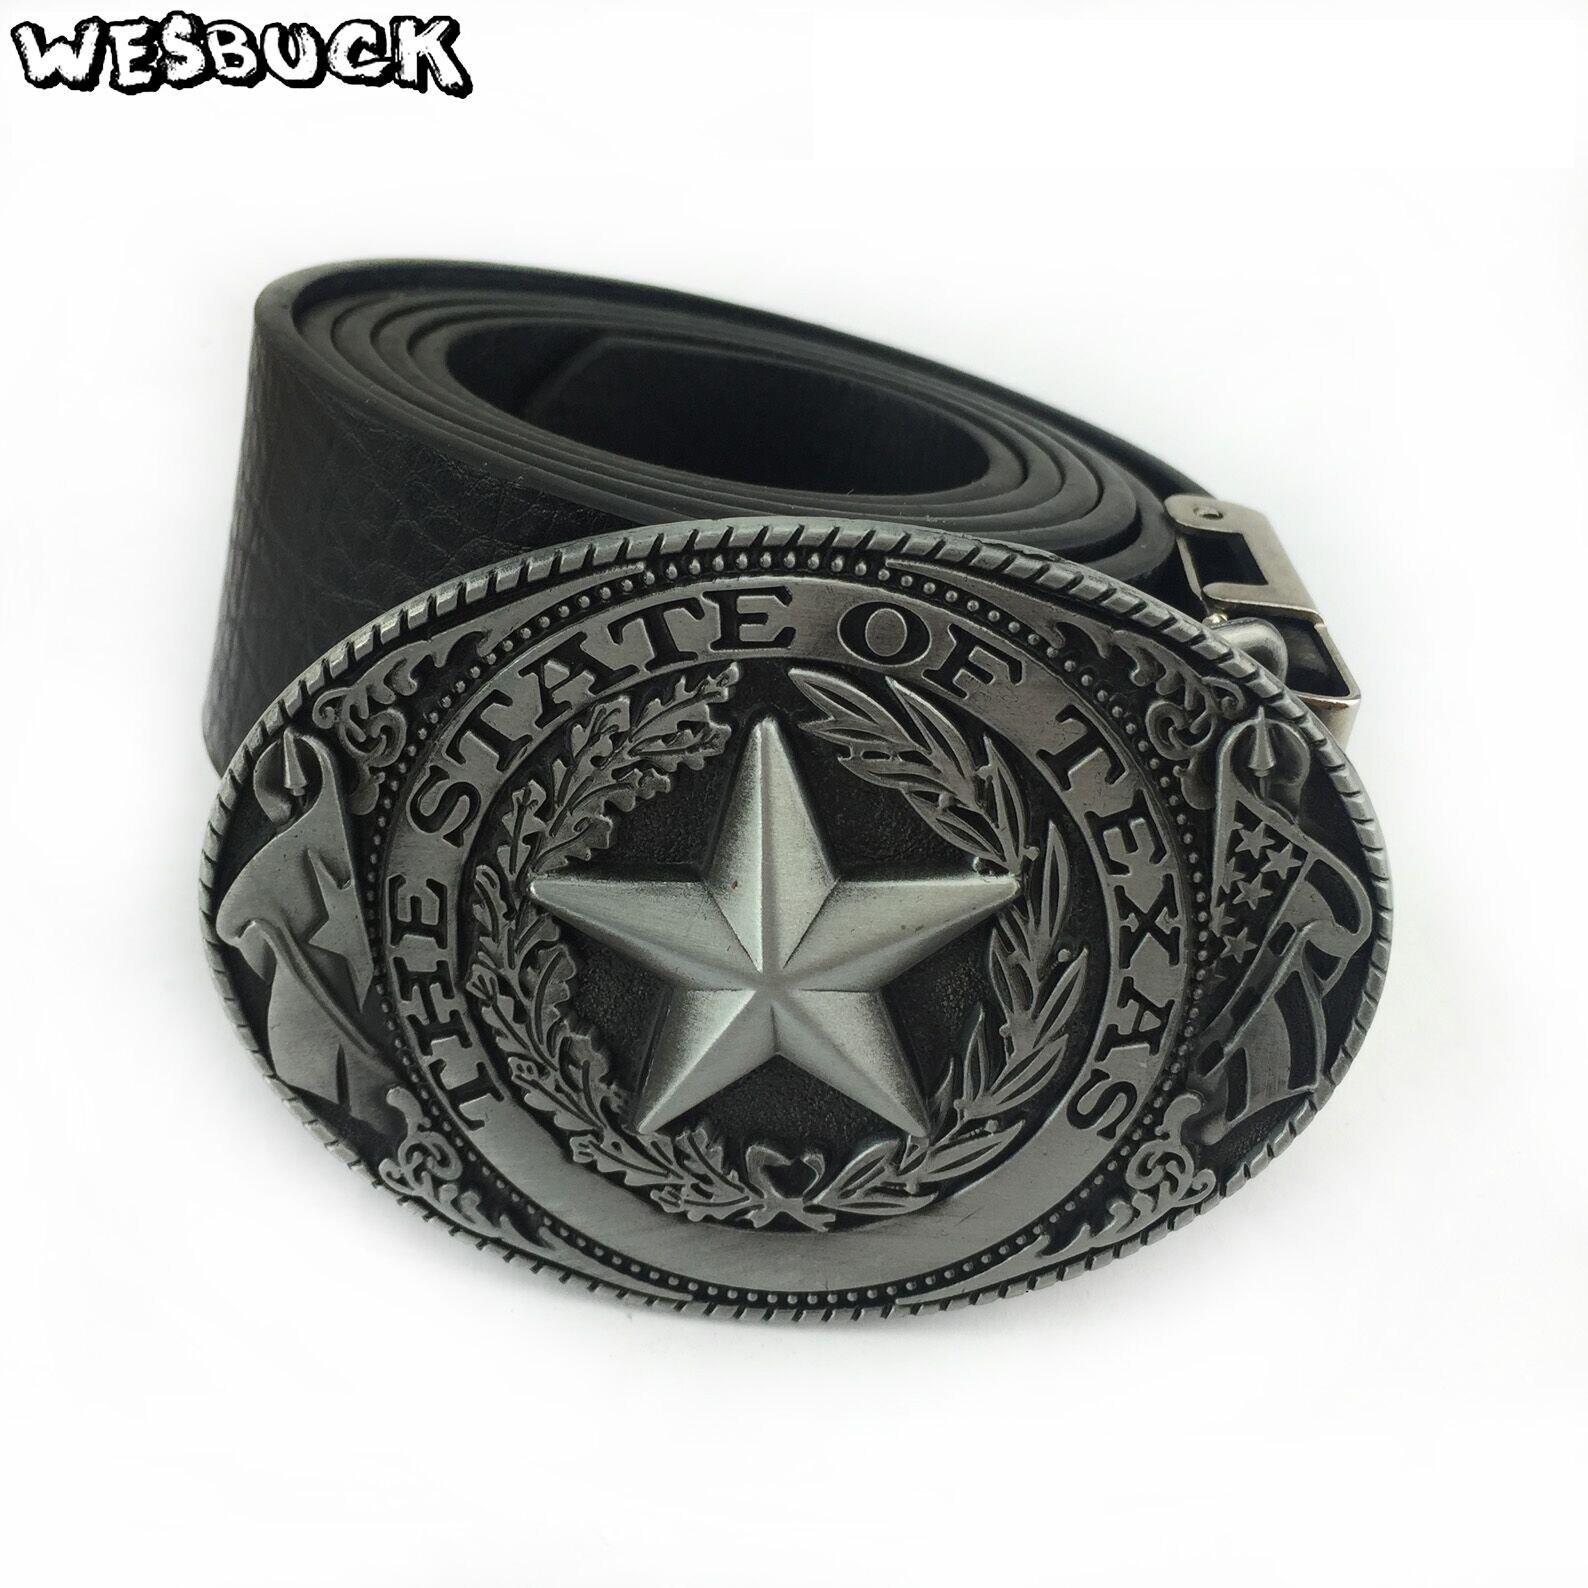 5 PCS MOQ WesBuck Brand Retro Plating Process State of Texas Flag Logo Cowboy Belt Buckle Mens Big Buckles for Belt Accessories